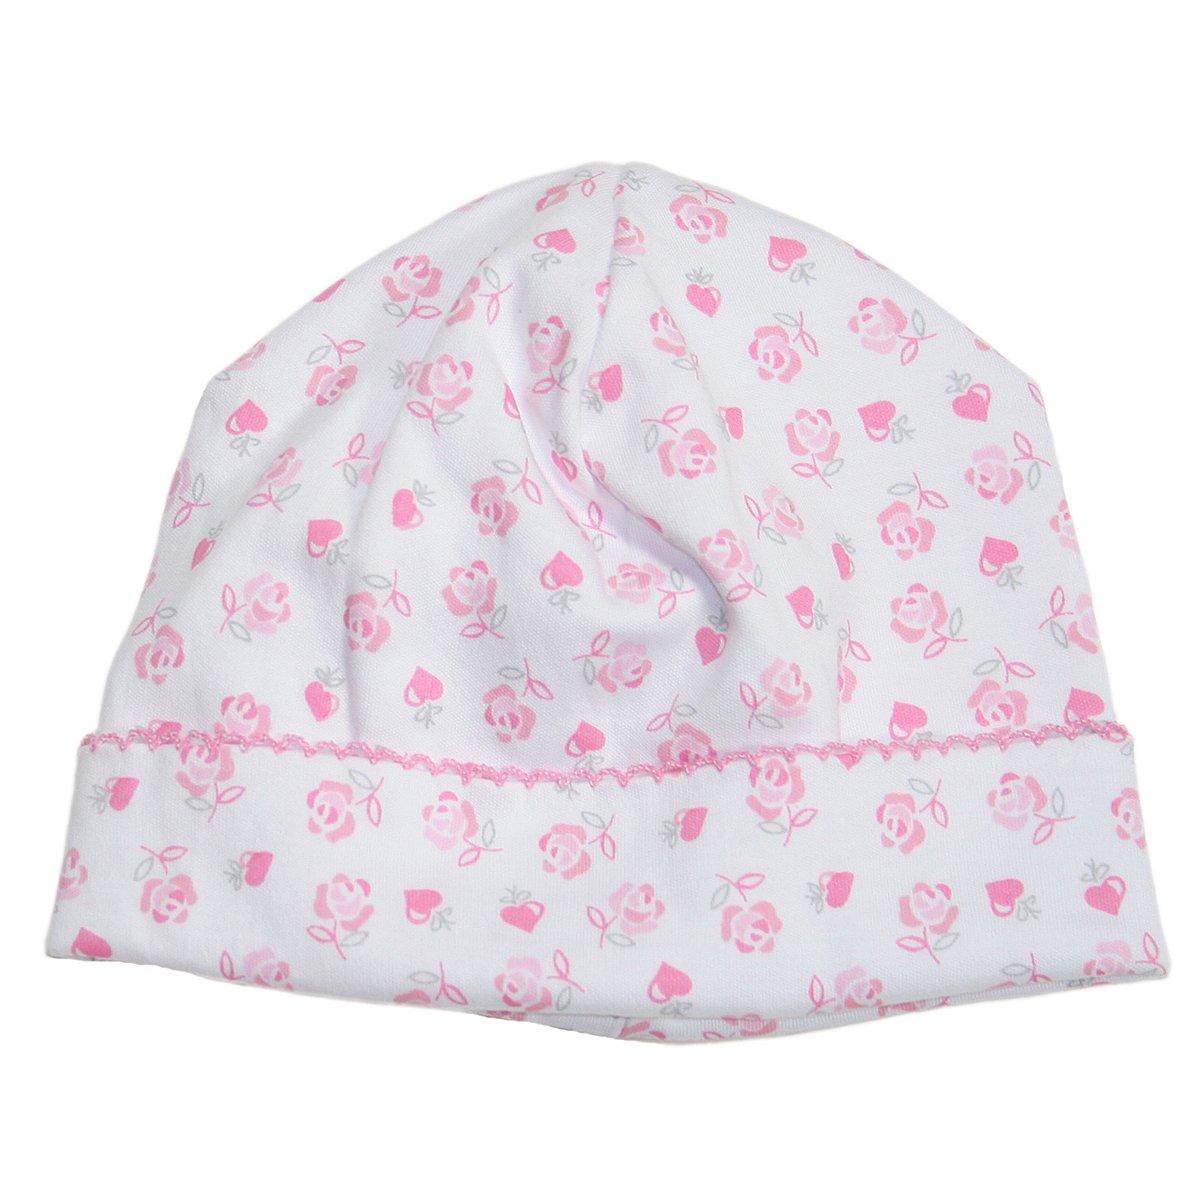 Kissy Kissy Baby Hearts and Roses Print Hat